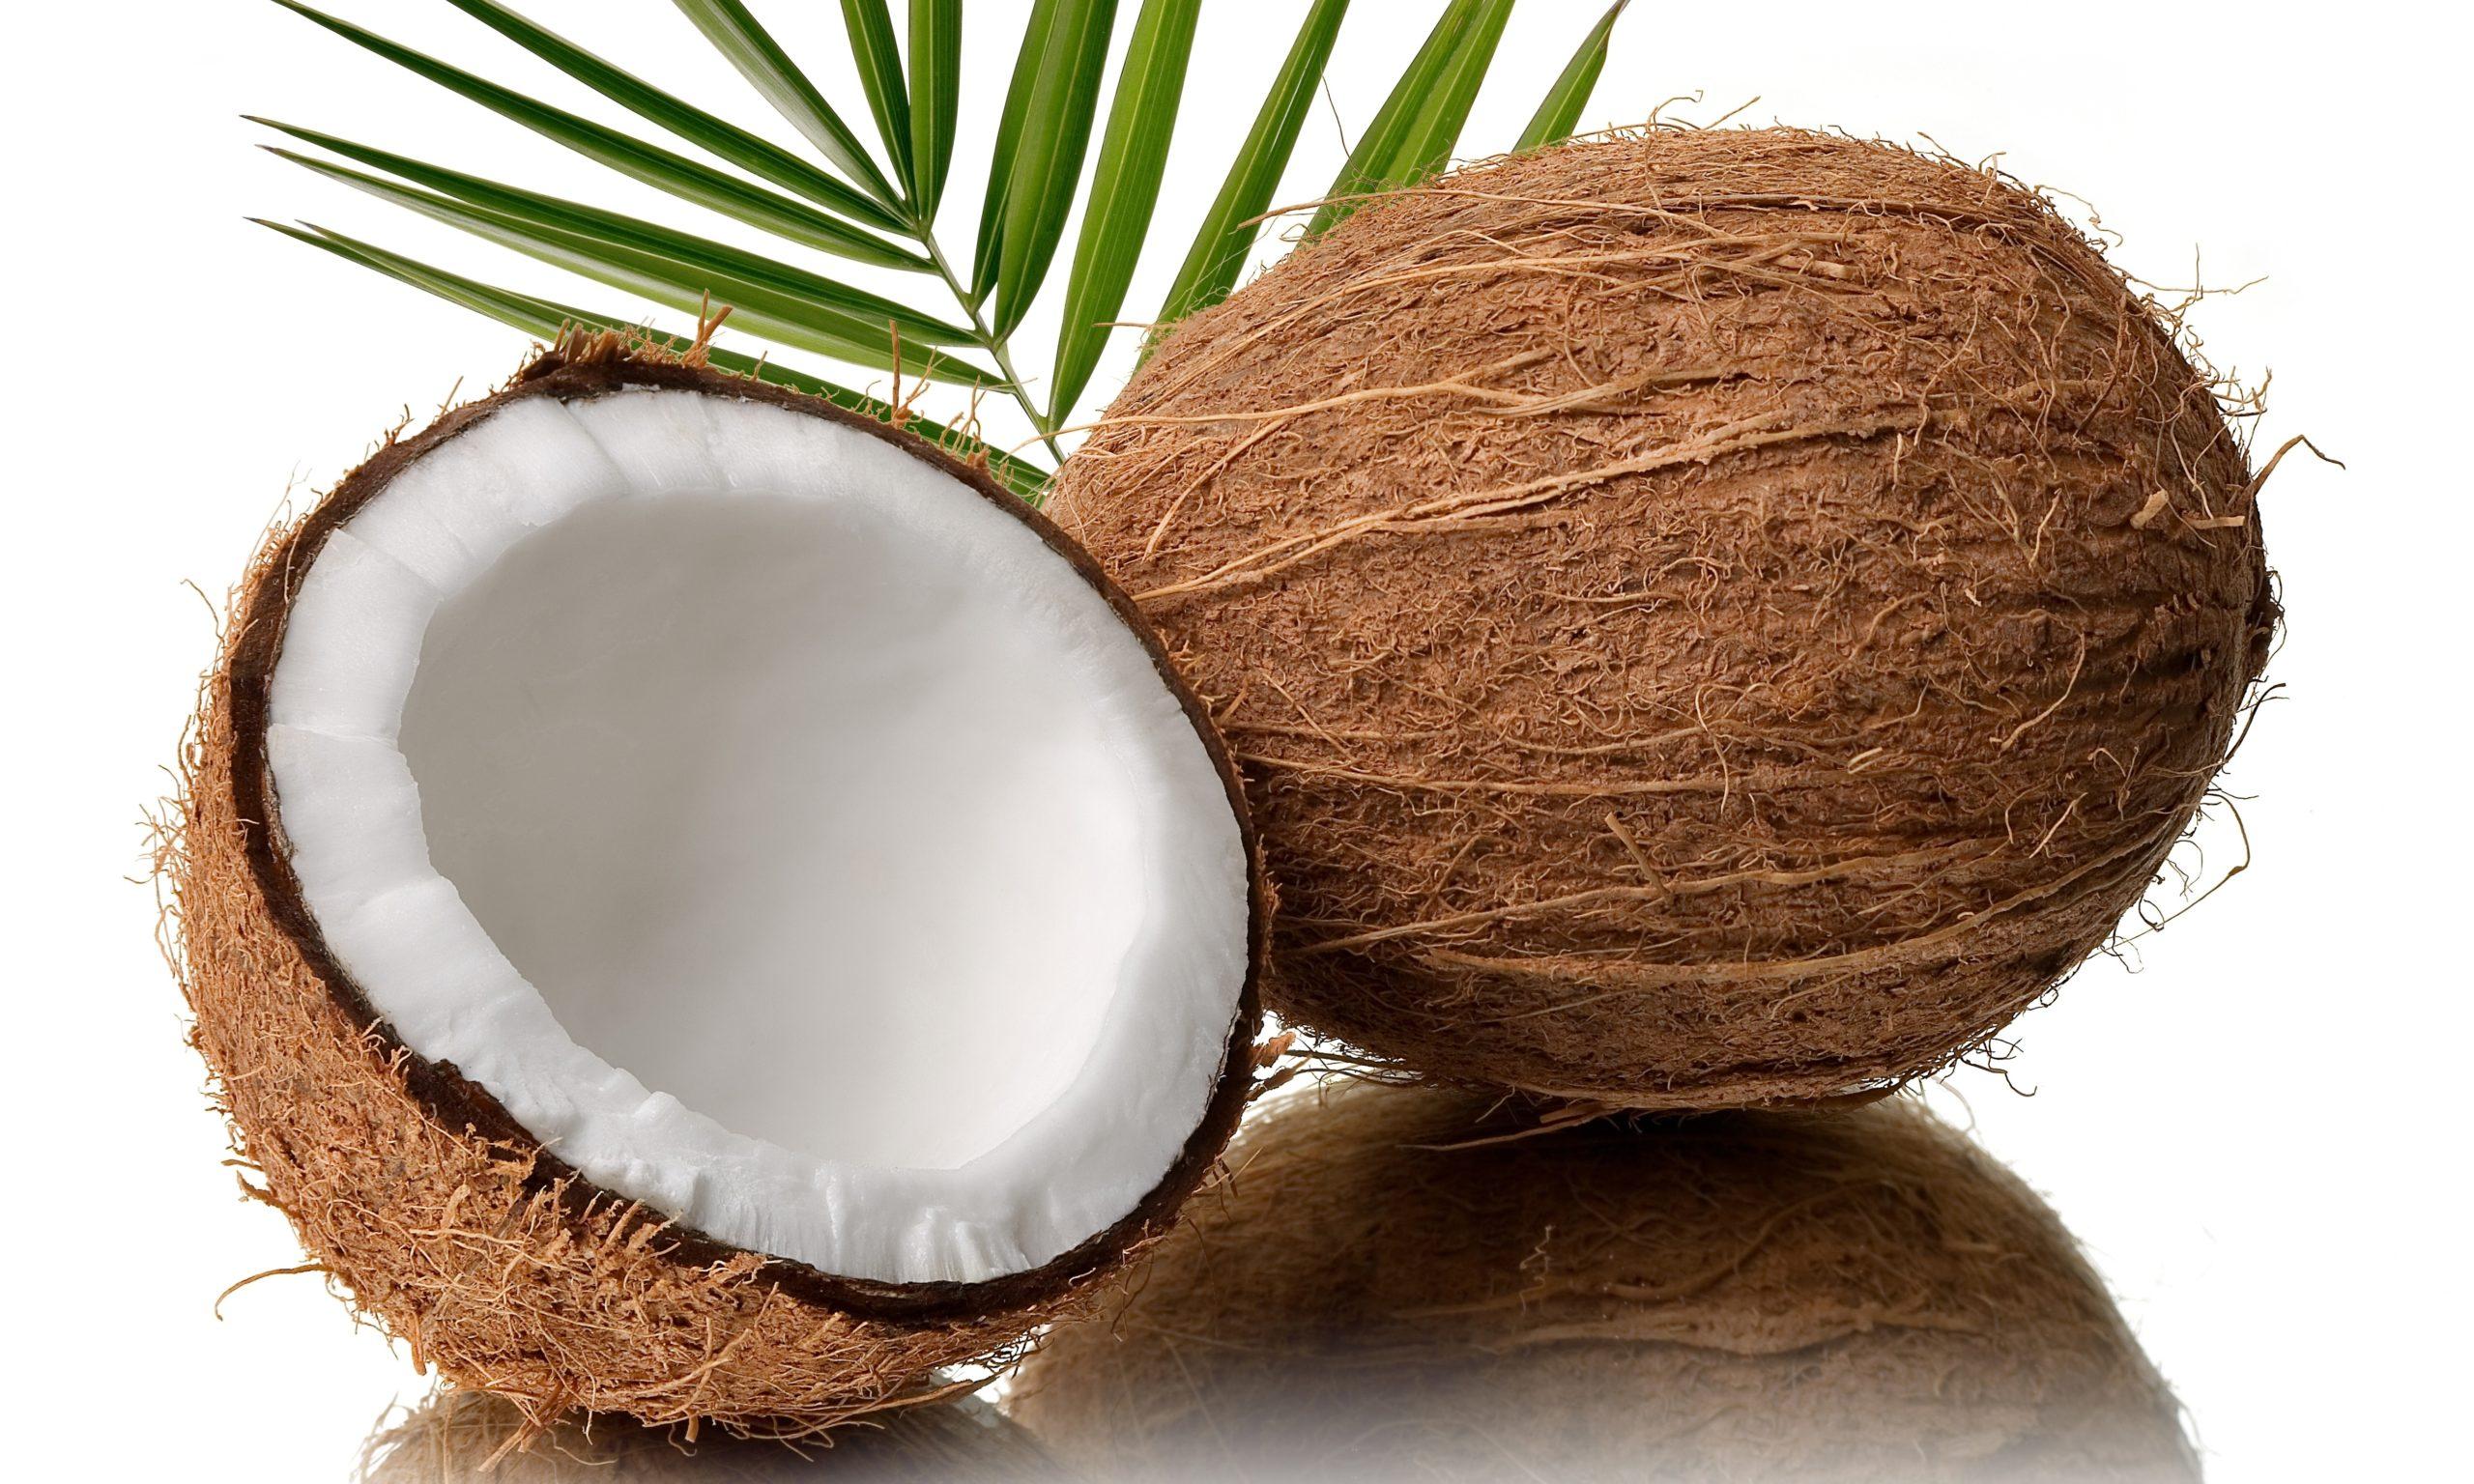 My coconut